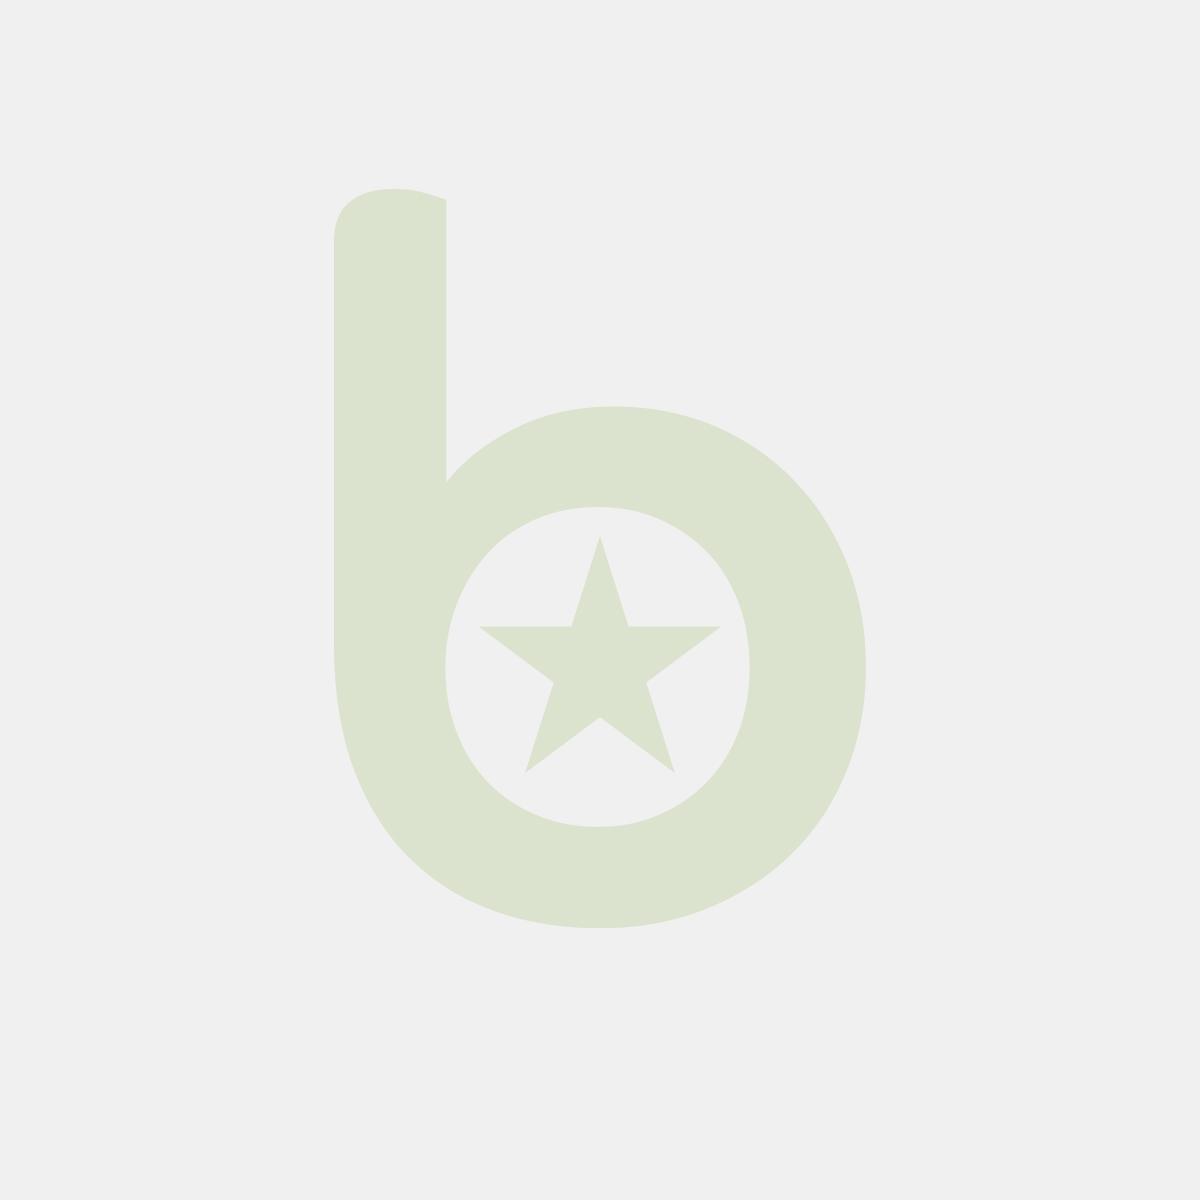 Tacka styropianowa czarna nr 73 (225x138x17mm), cena za 800 sztuk